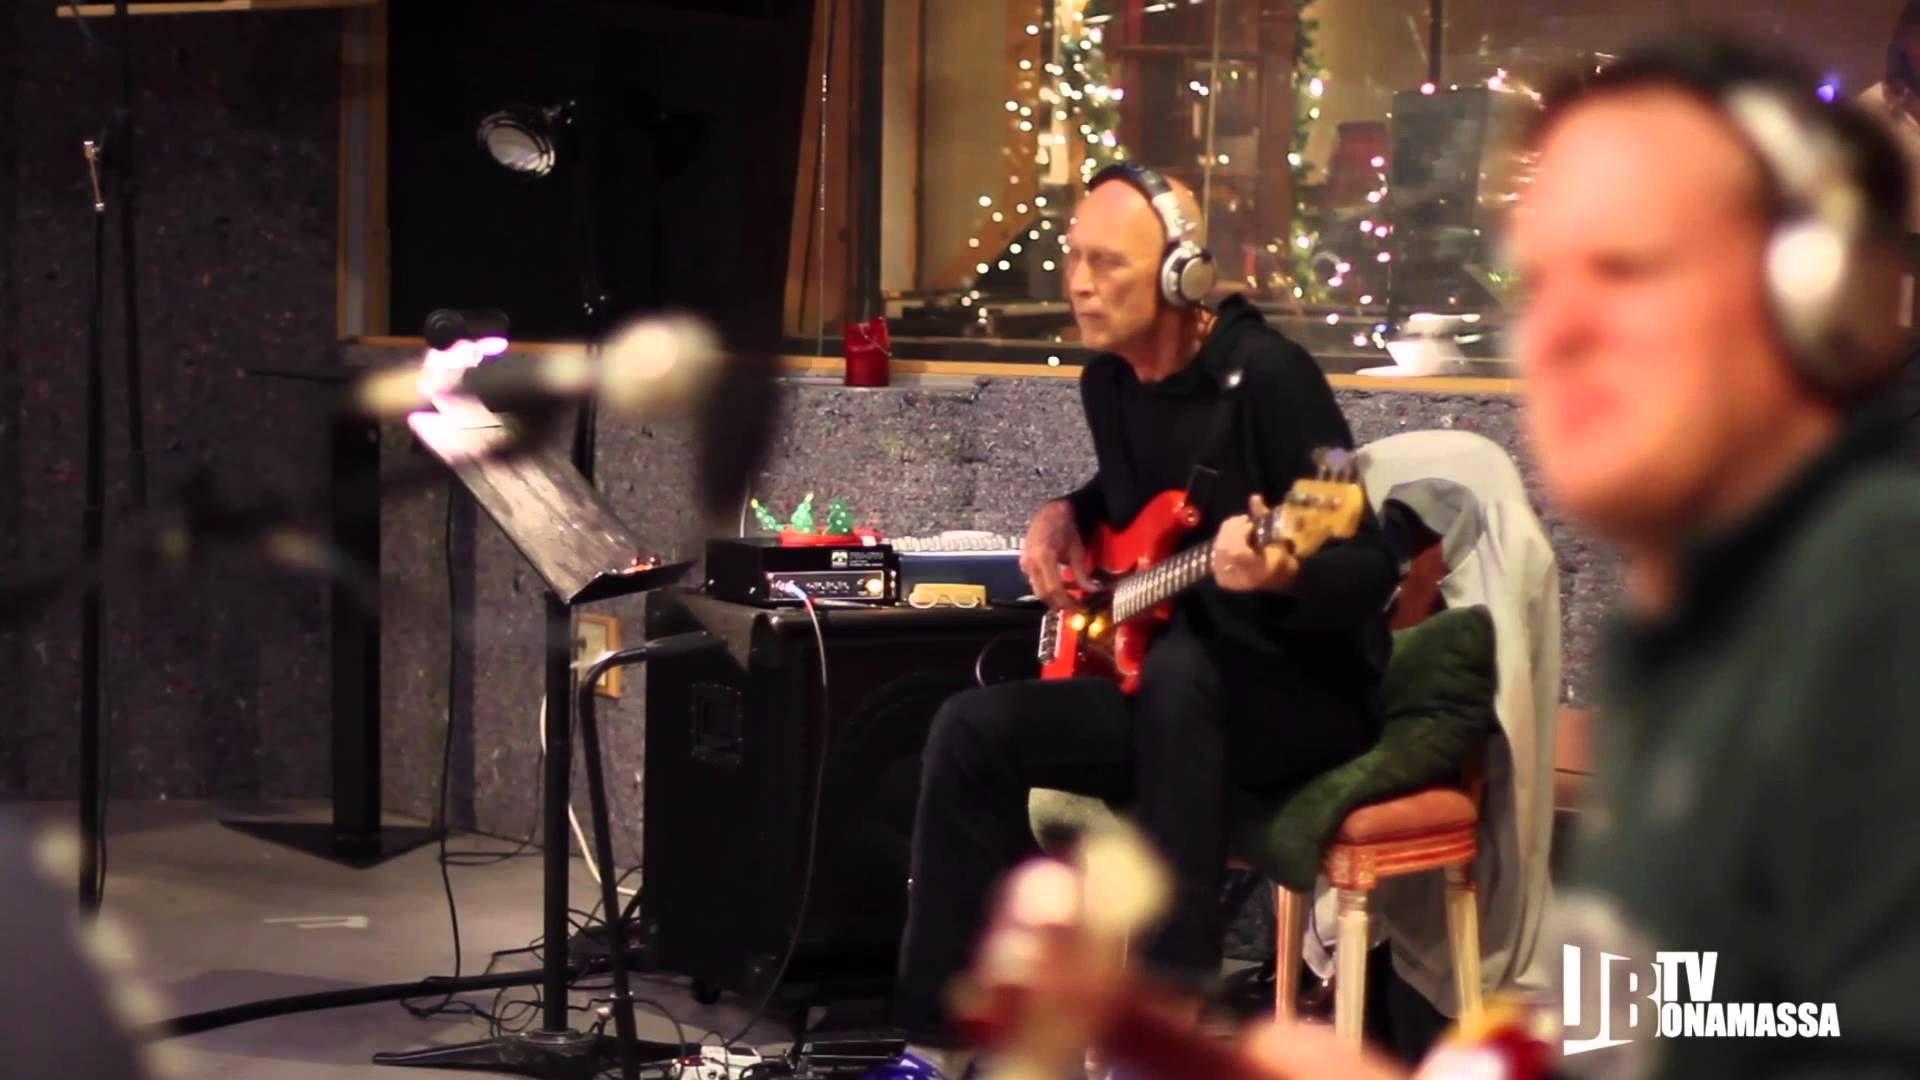 Joe Bonamassa - Lonesome Christmas - Offical Music Video | Eclectic ...